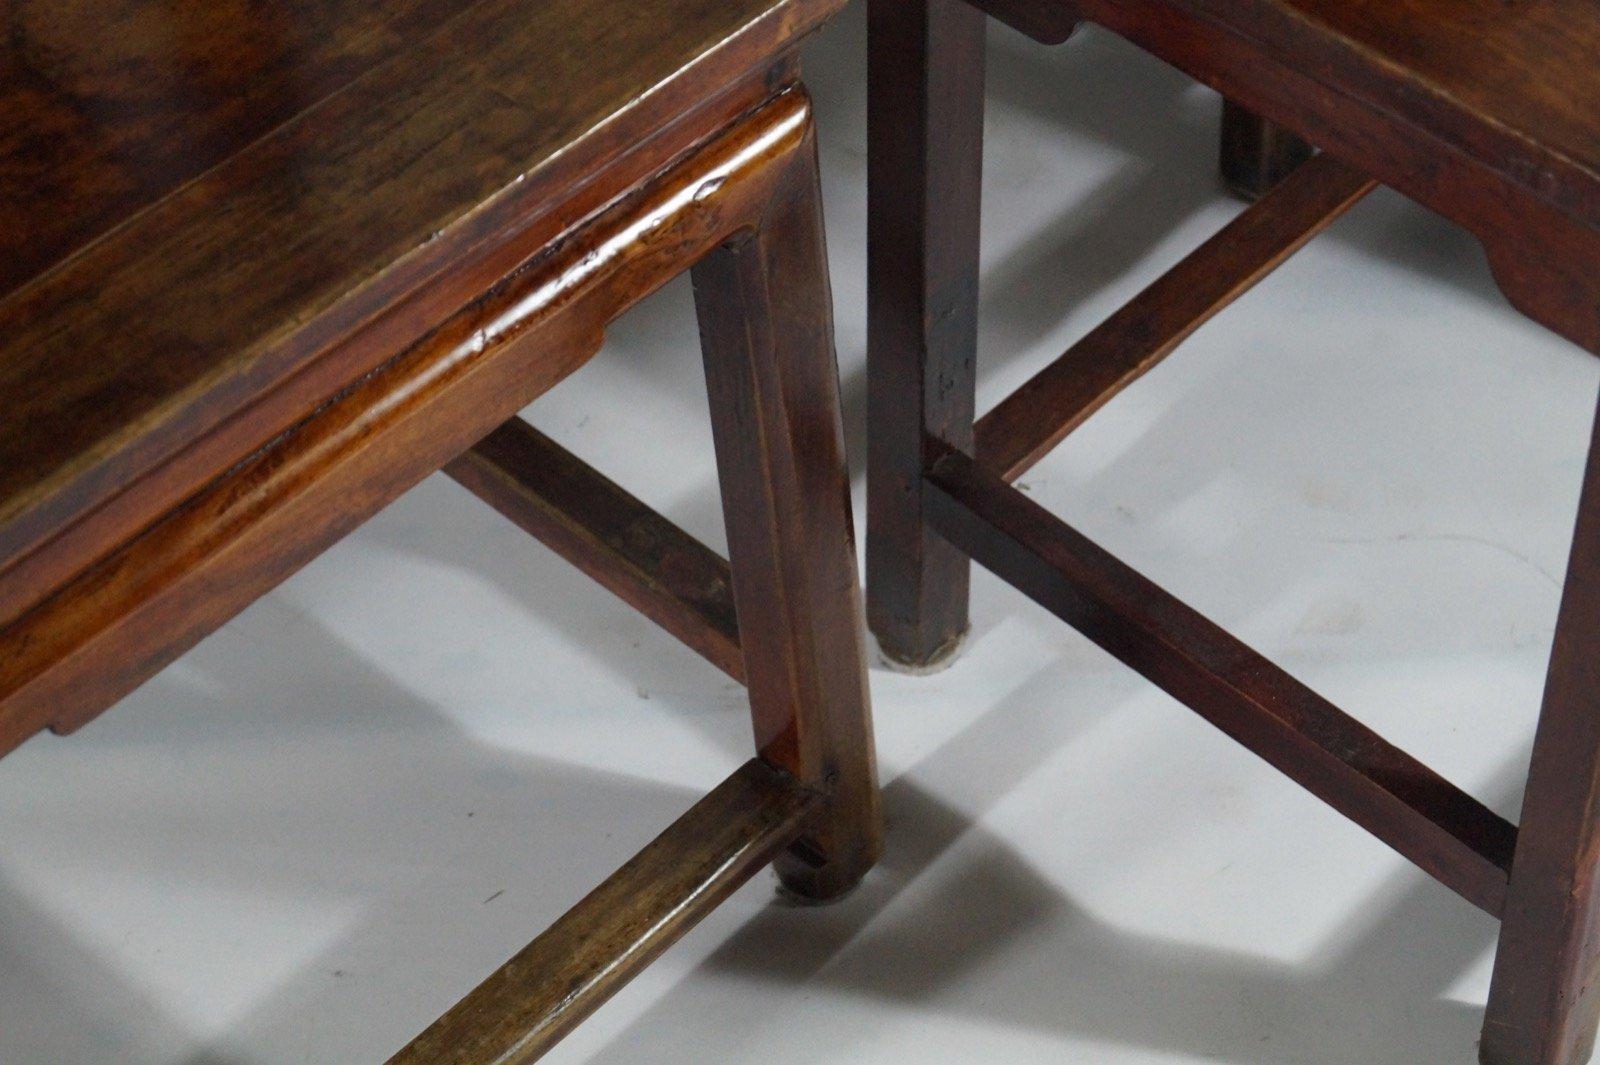 antike rote chinese st hle aus geschnitztem holz 1860er 4er set bei pamono kaufen. Black Bedroom Furniture Sets. Home Design Ideas